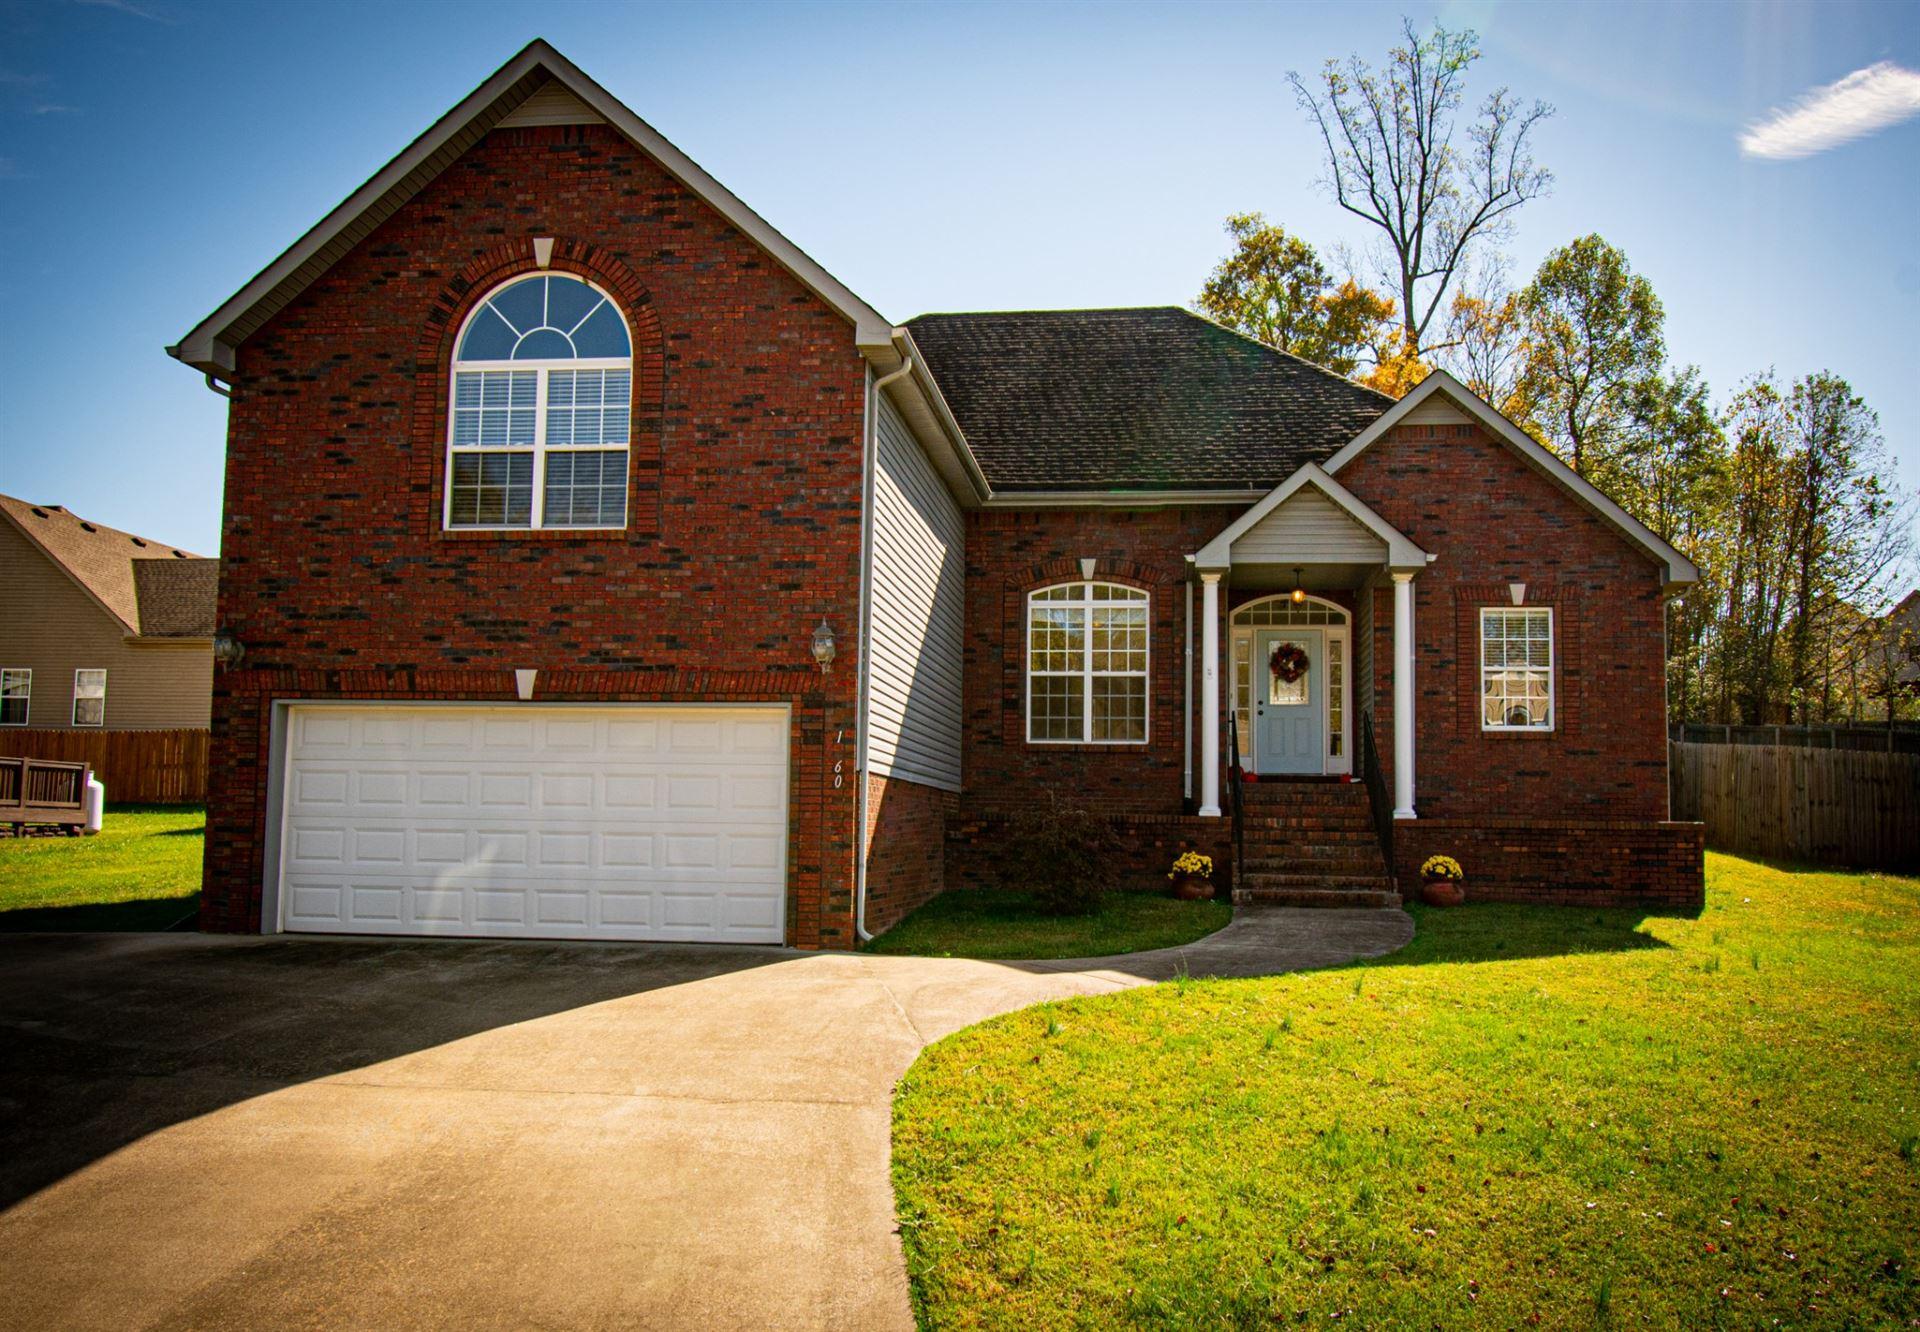 1260 Viewmont Dr, Clarksville, TN 37040 - MLS#: 2202064